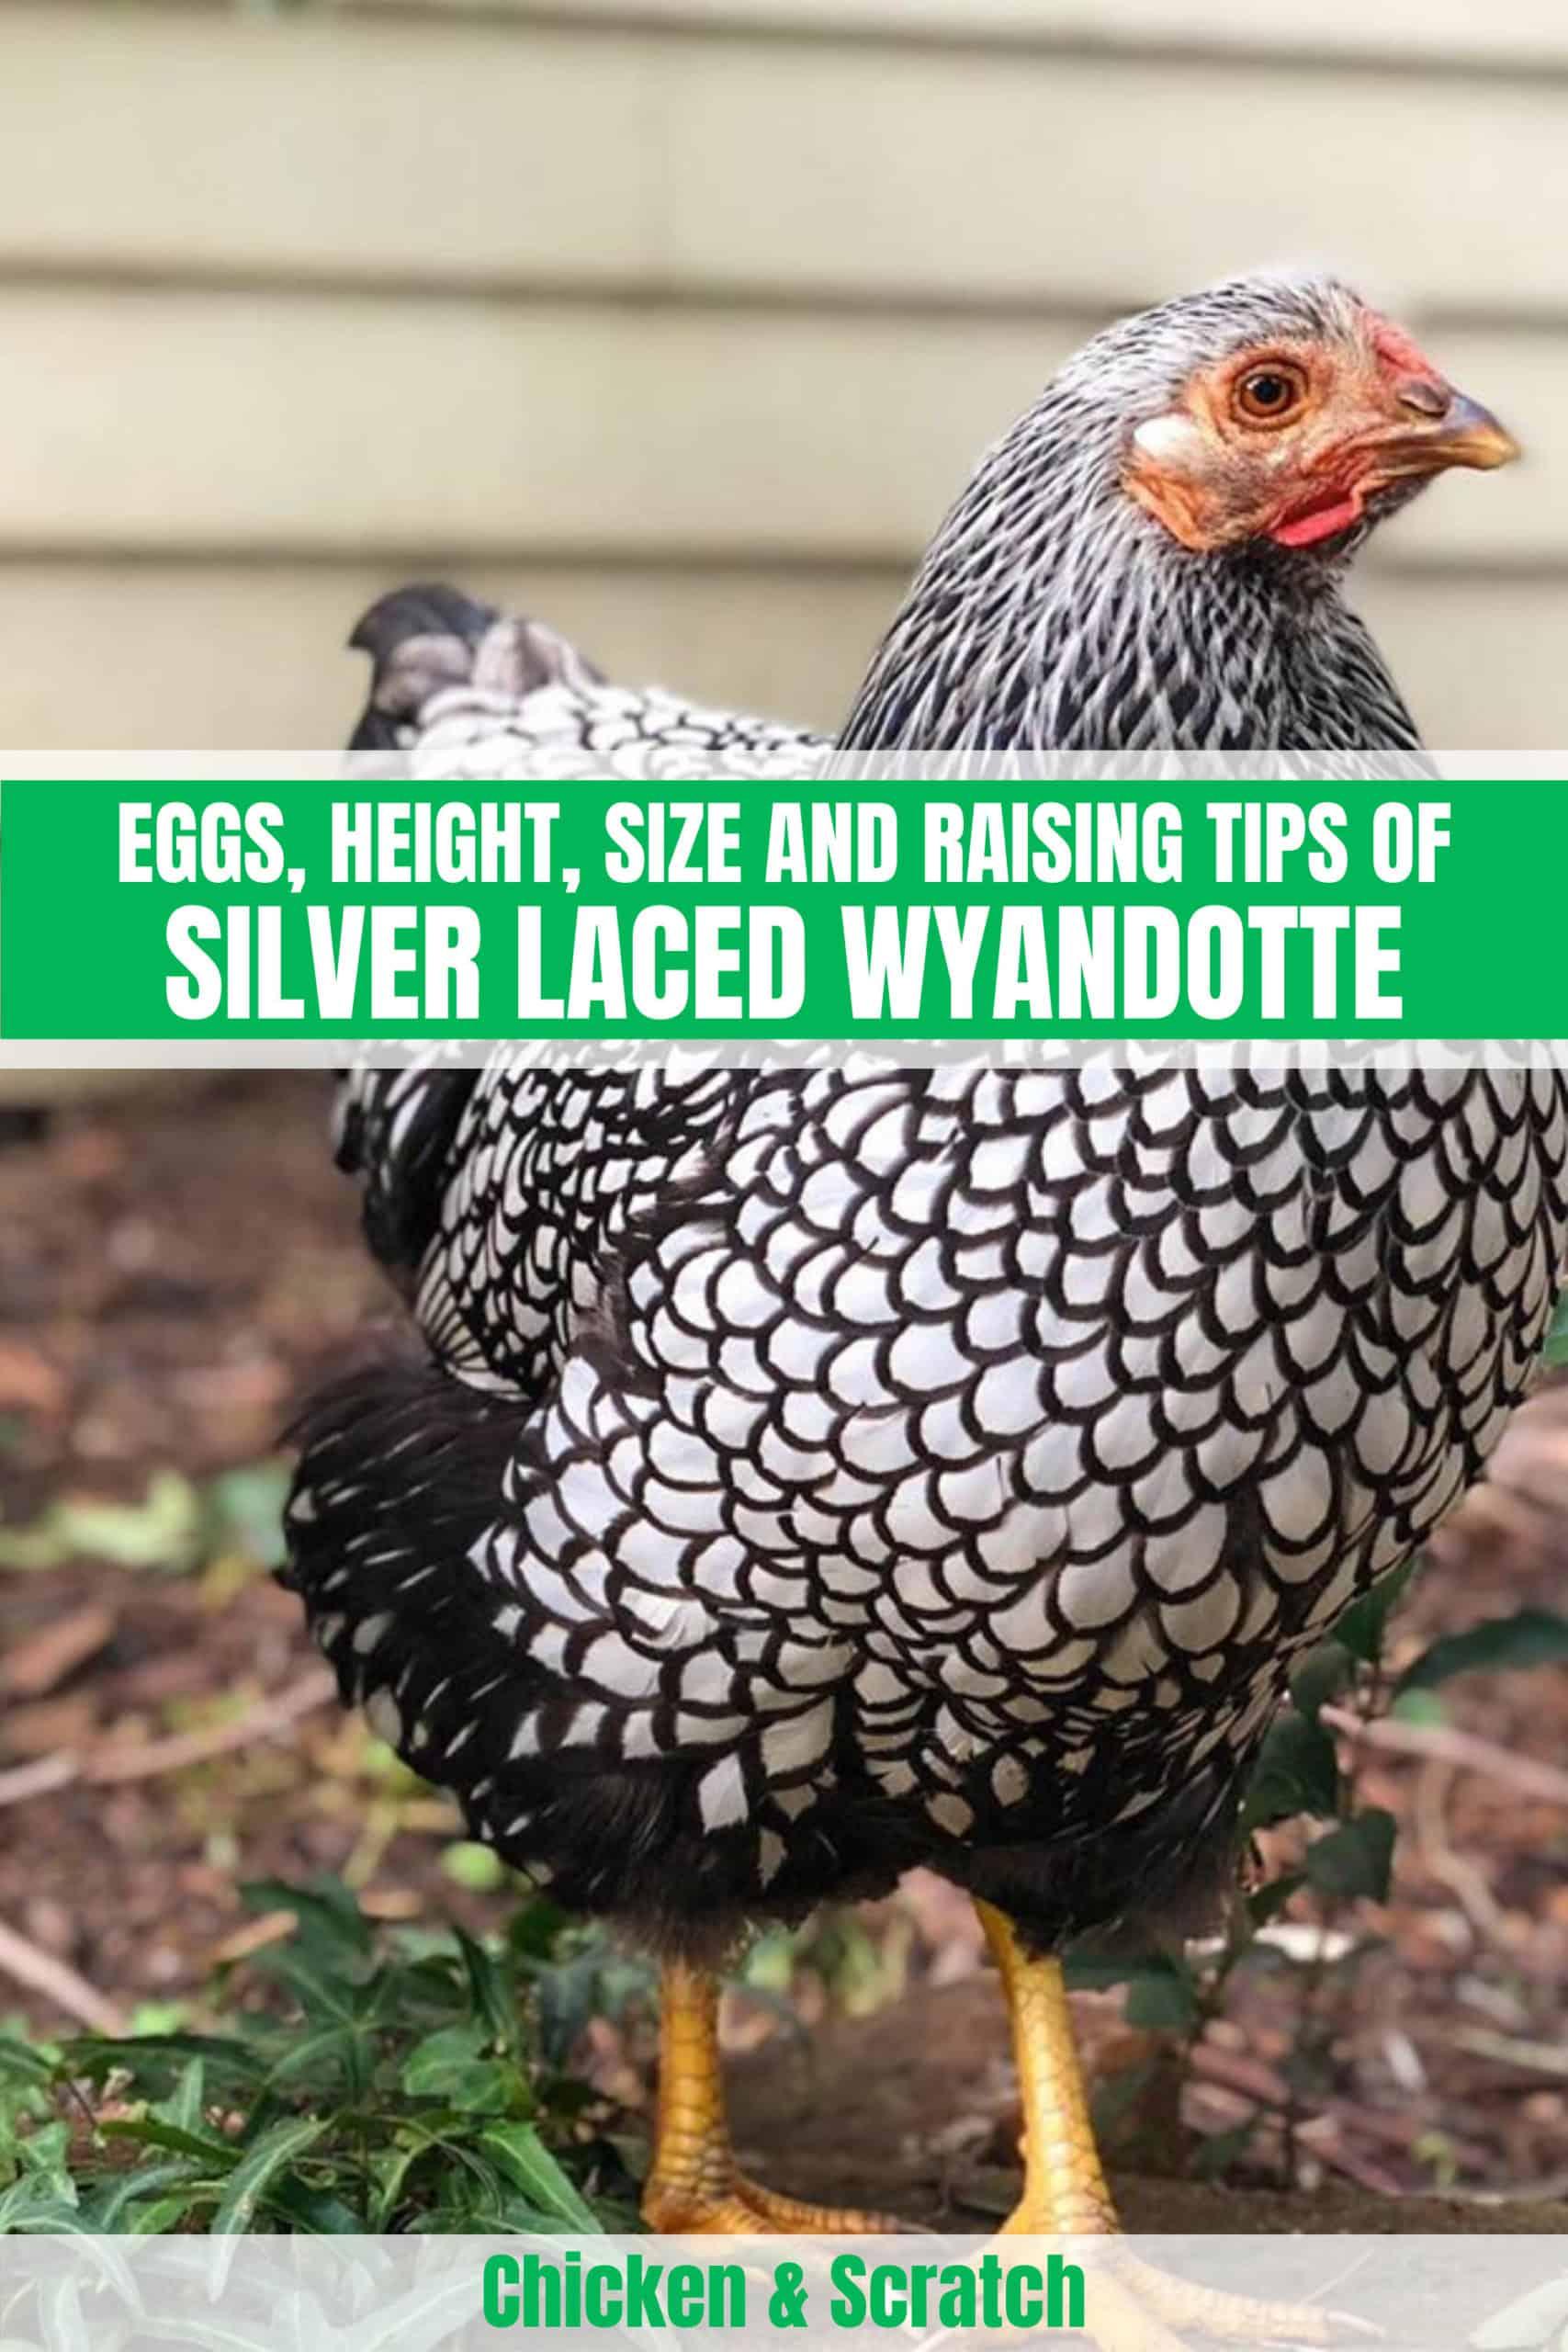 silver laced wyandotte